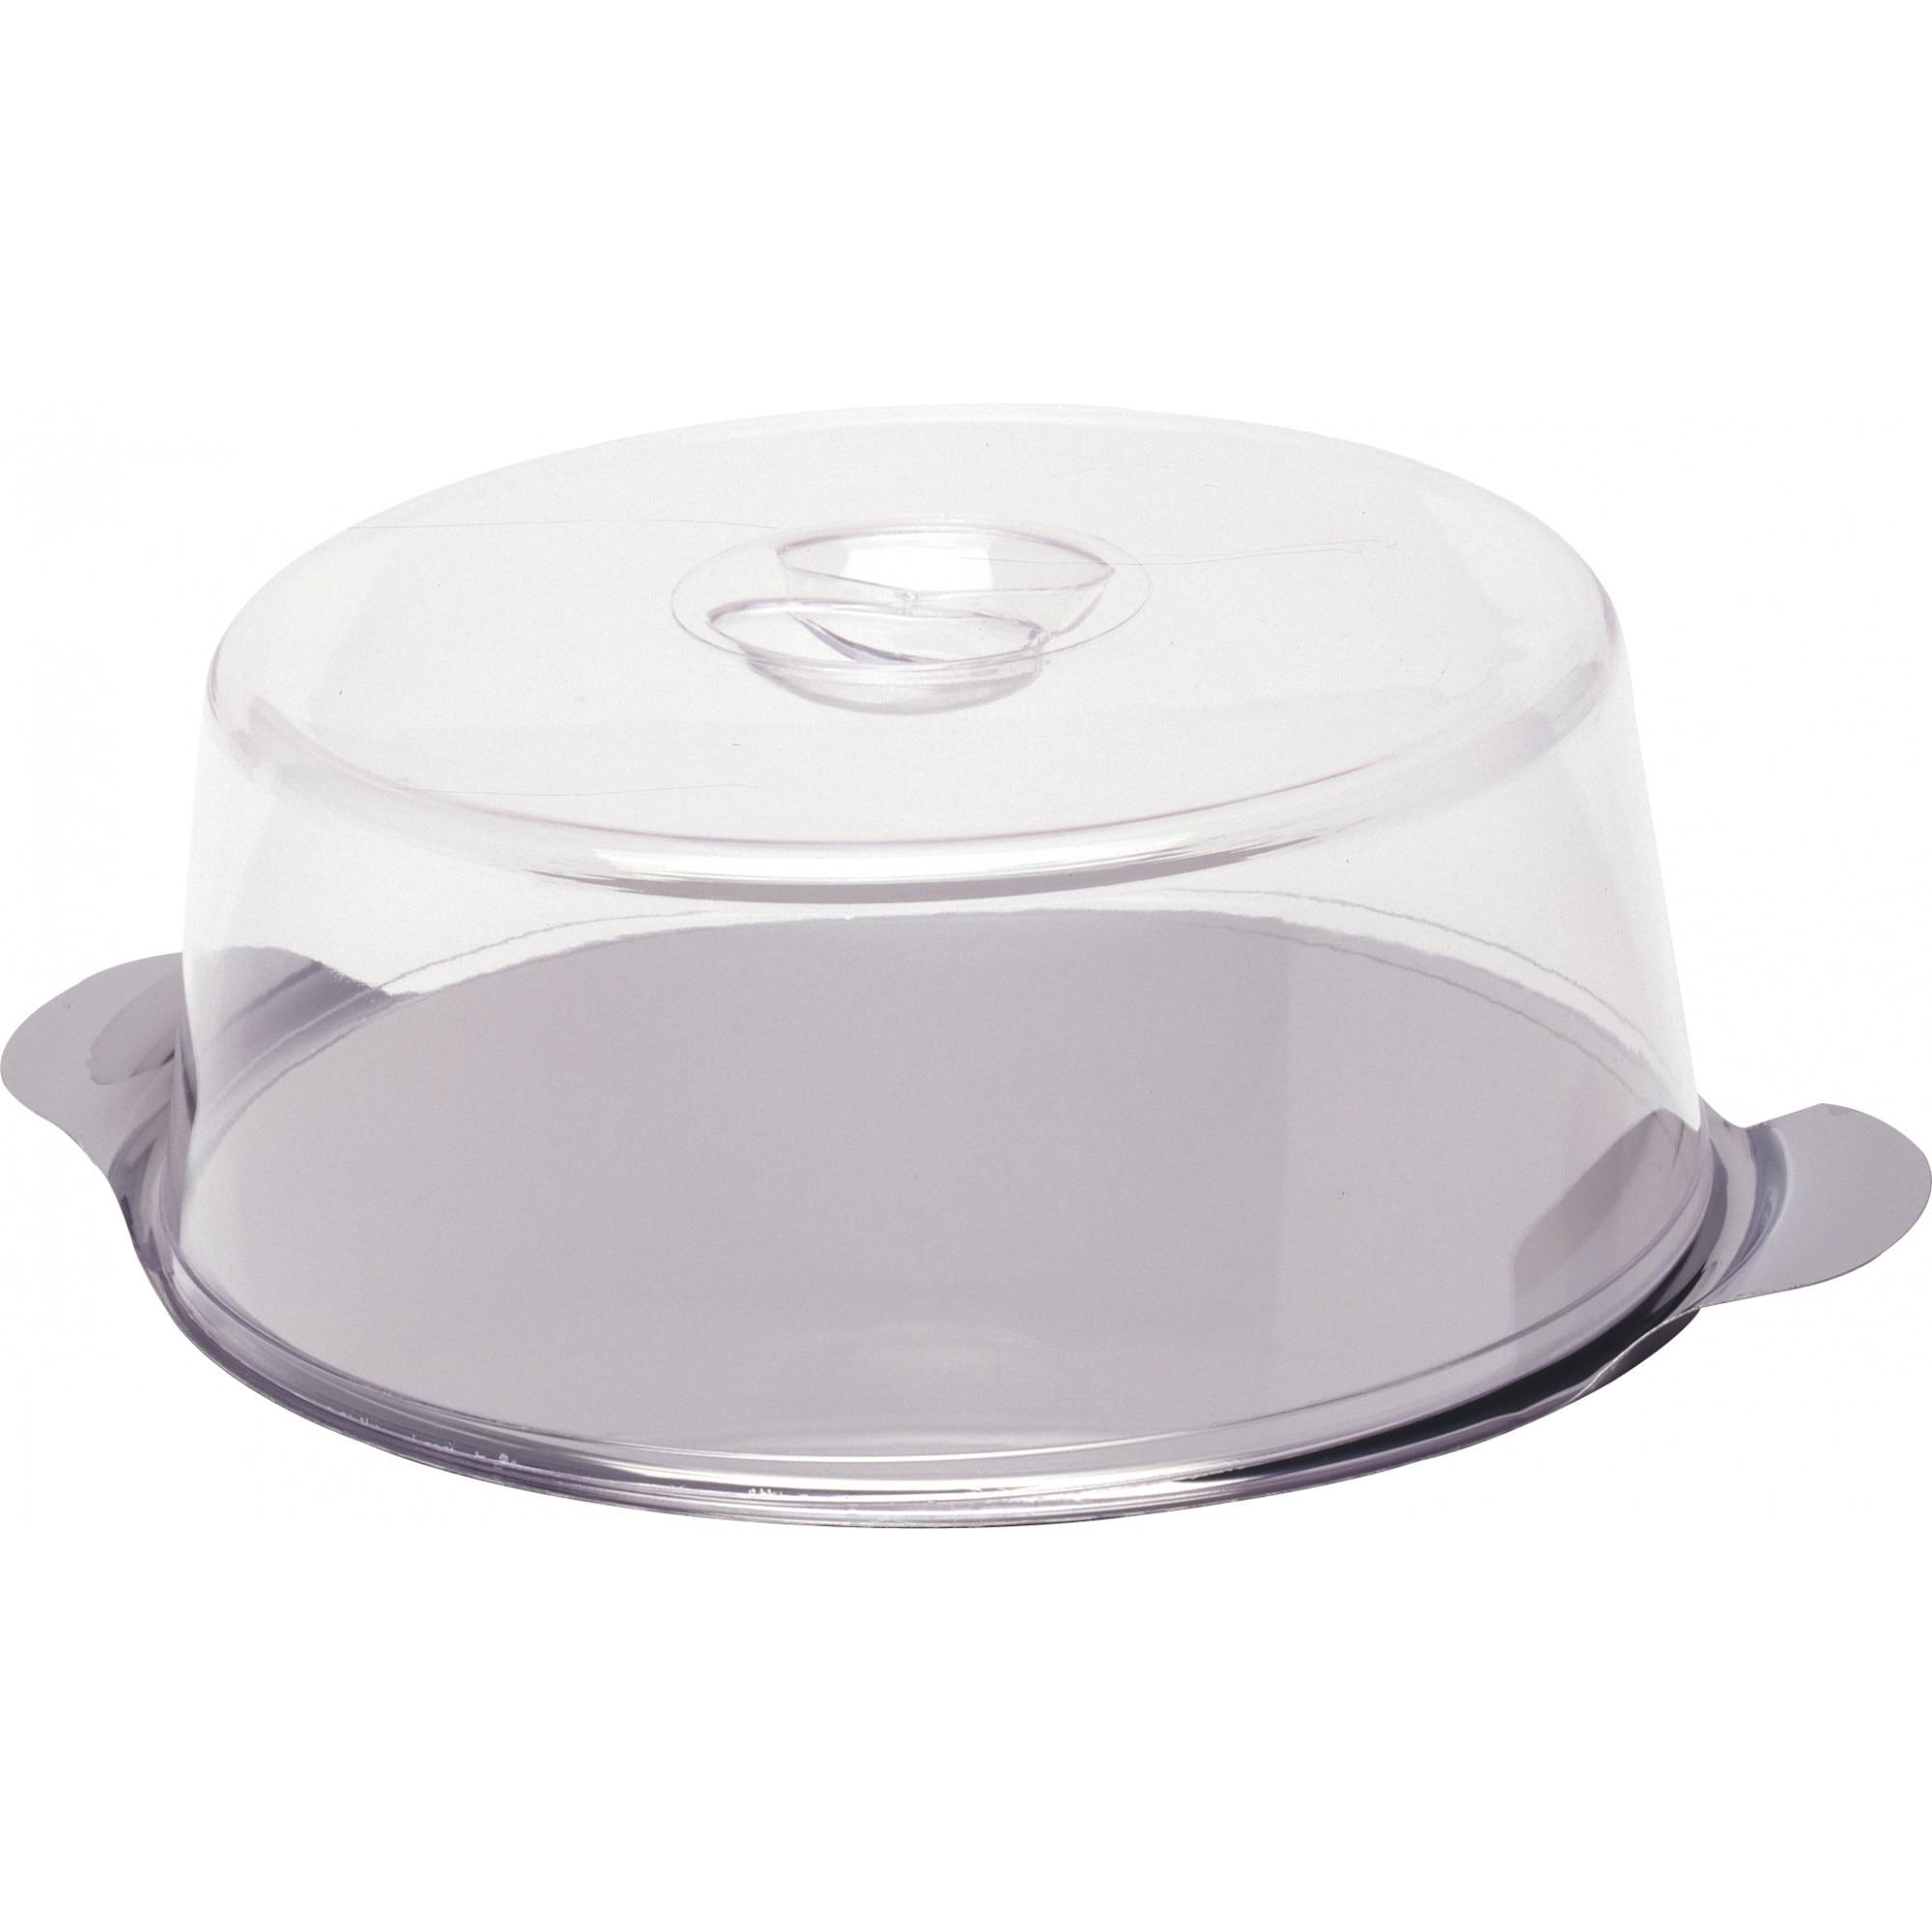 Fotografie Platou tort cu capac Hendi, otel inoxidabil/plastic SAN, Ø30x(H)11 cm